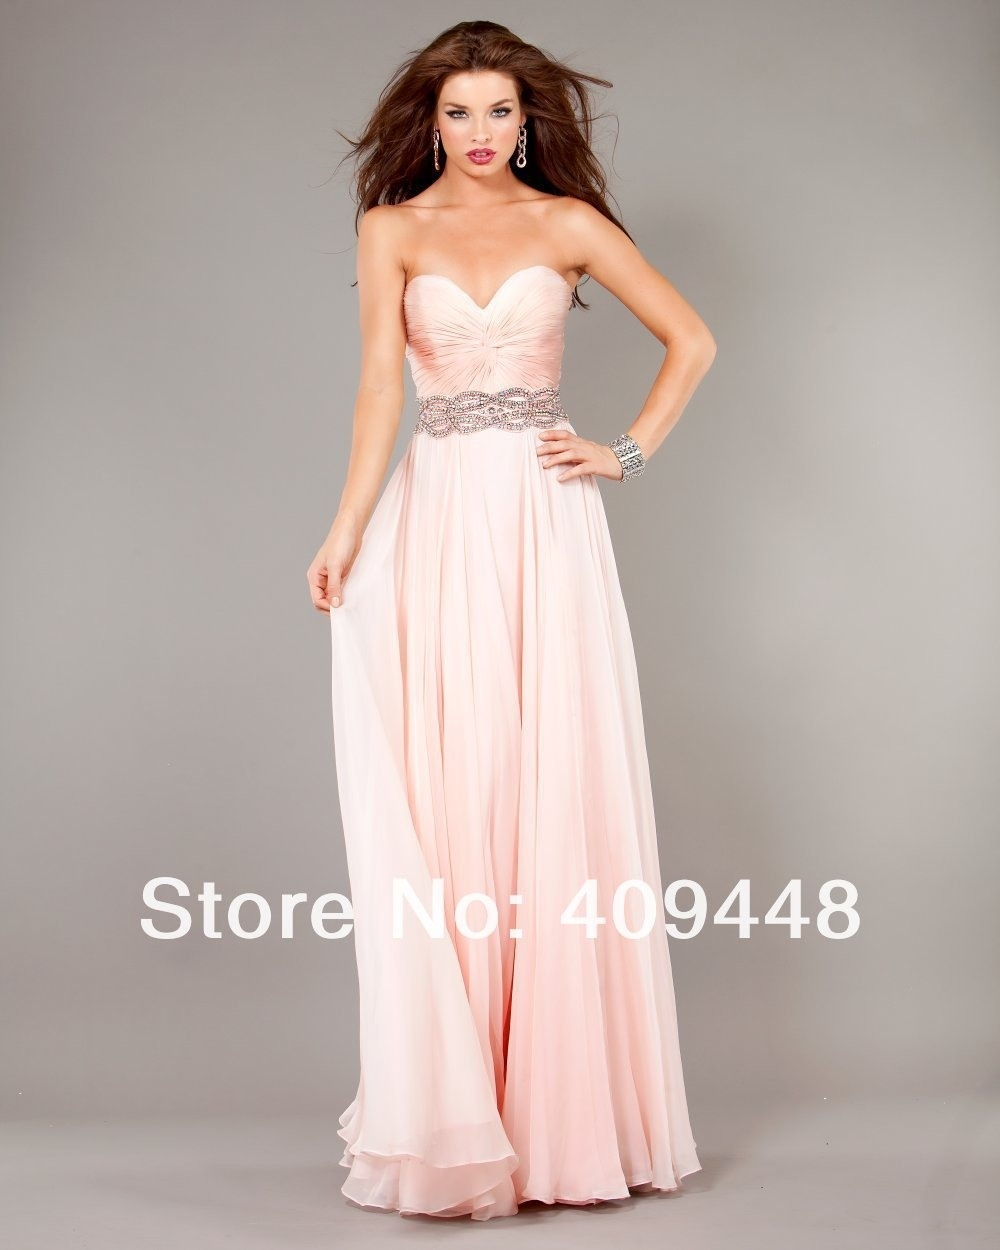 13 Luxurius Rosa Kleid Lang für 201910 Fantastisch Rosa Kleid Lang Galerie